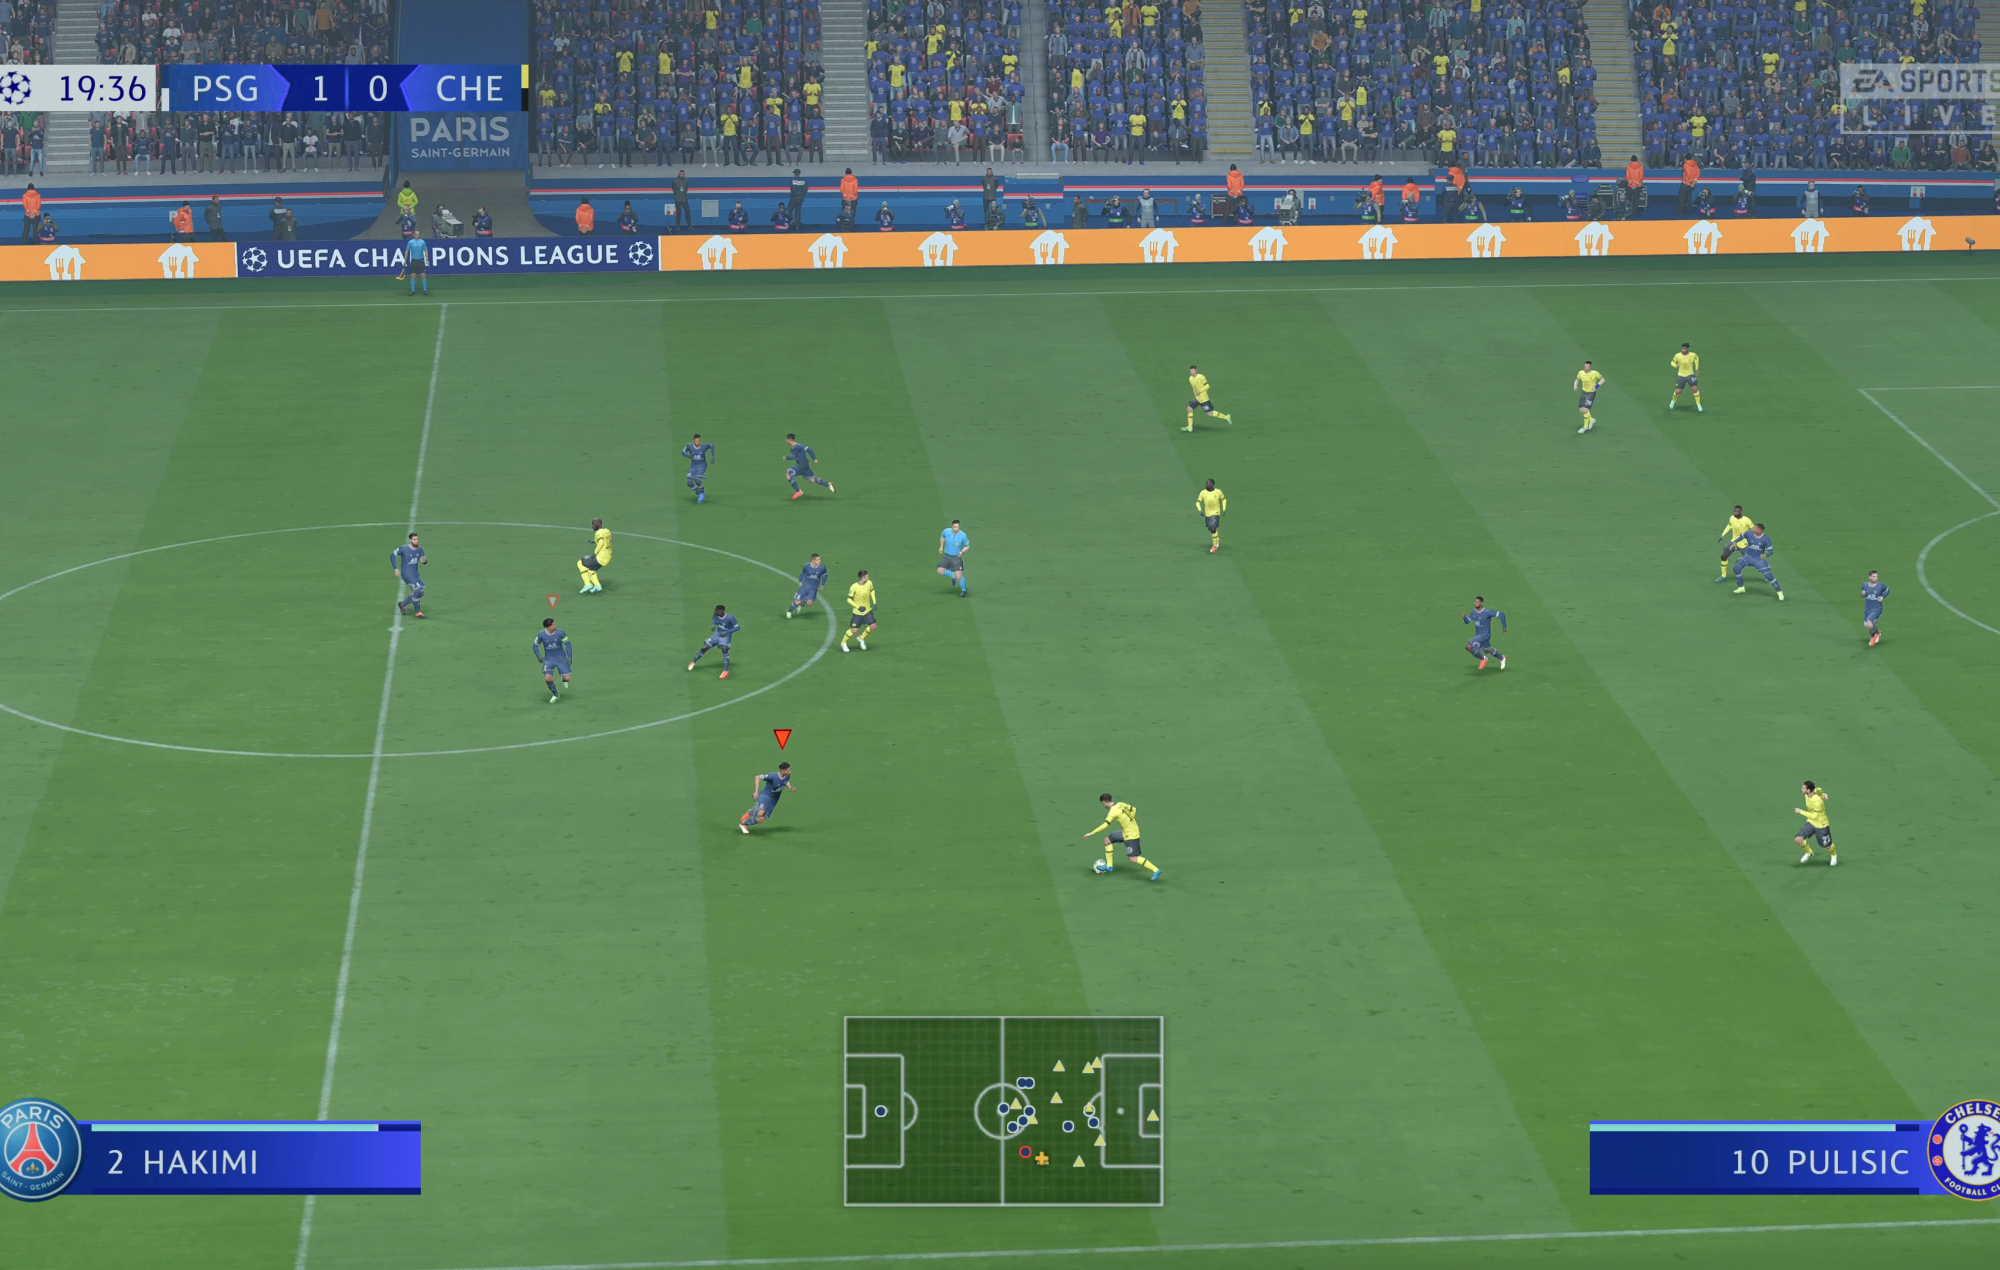 FIFA 22 PSG v Chelsea Champions League